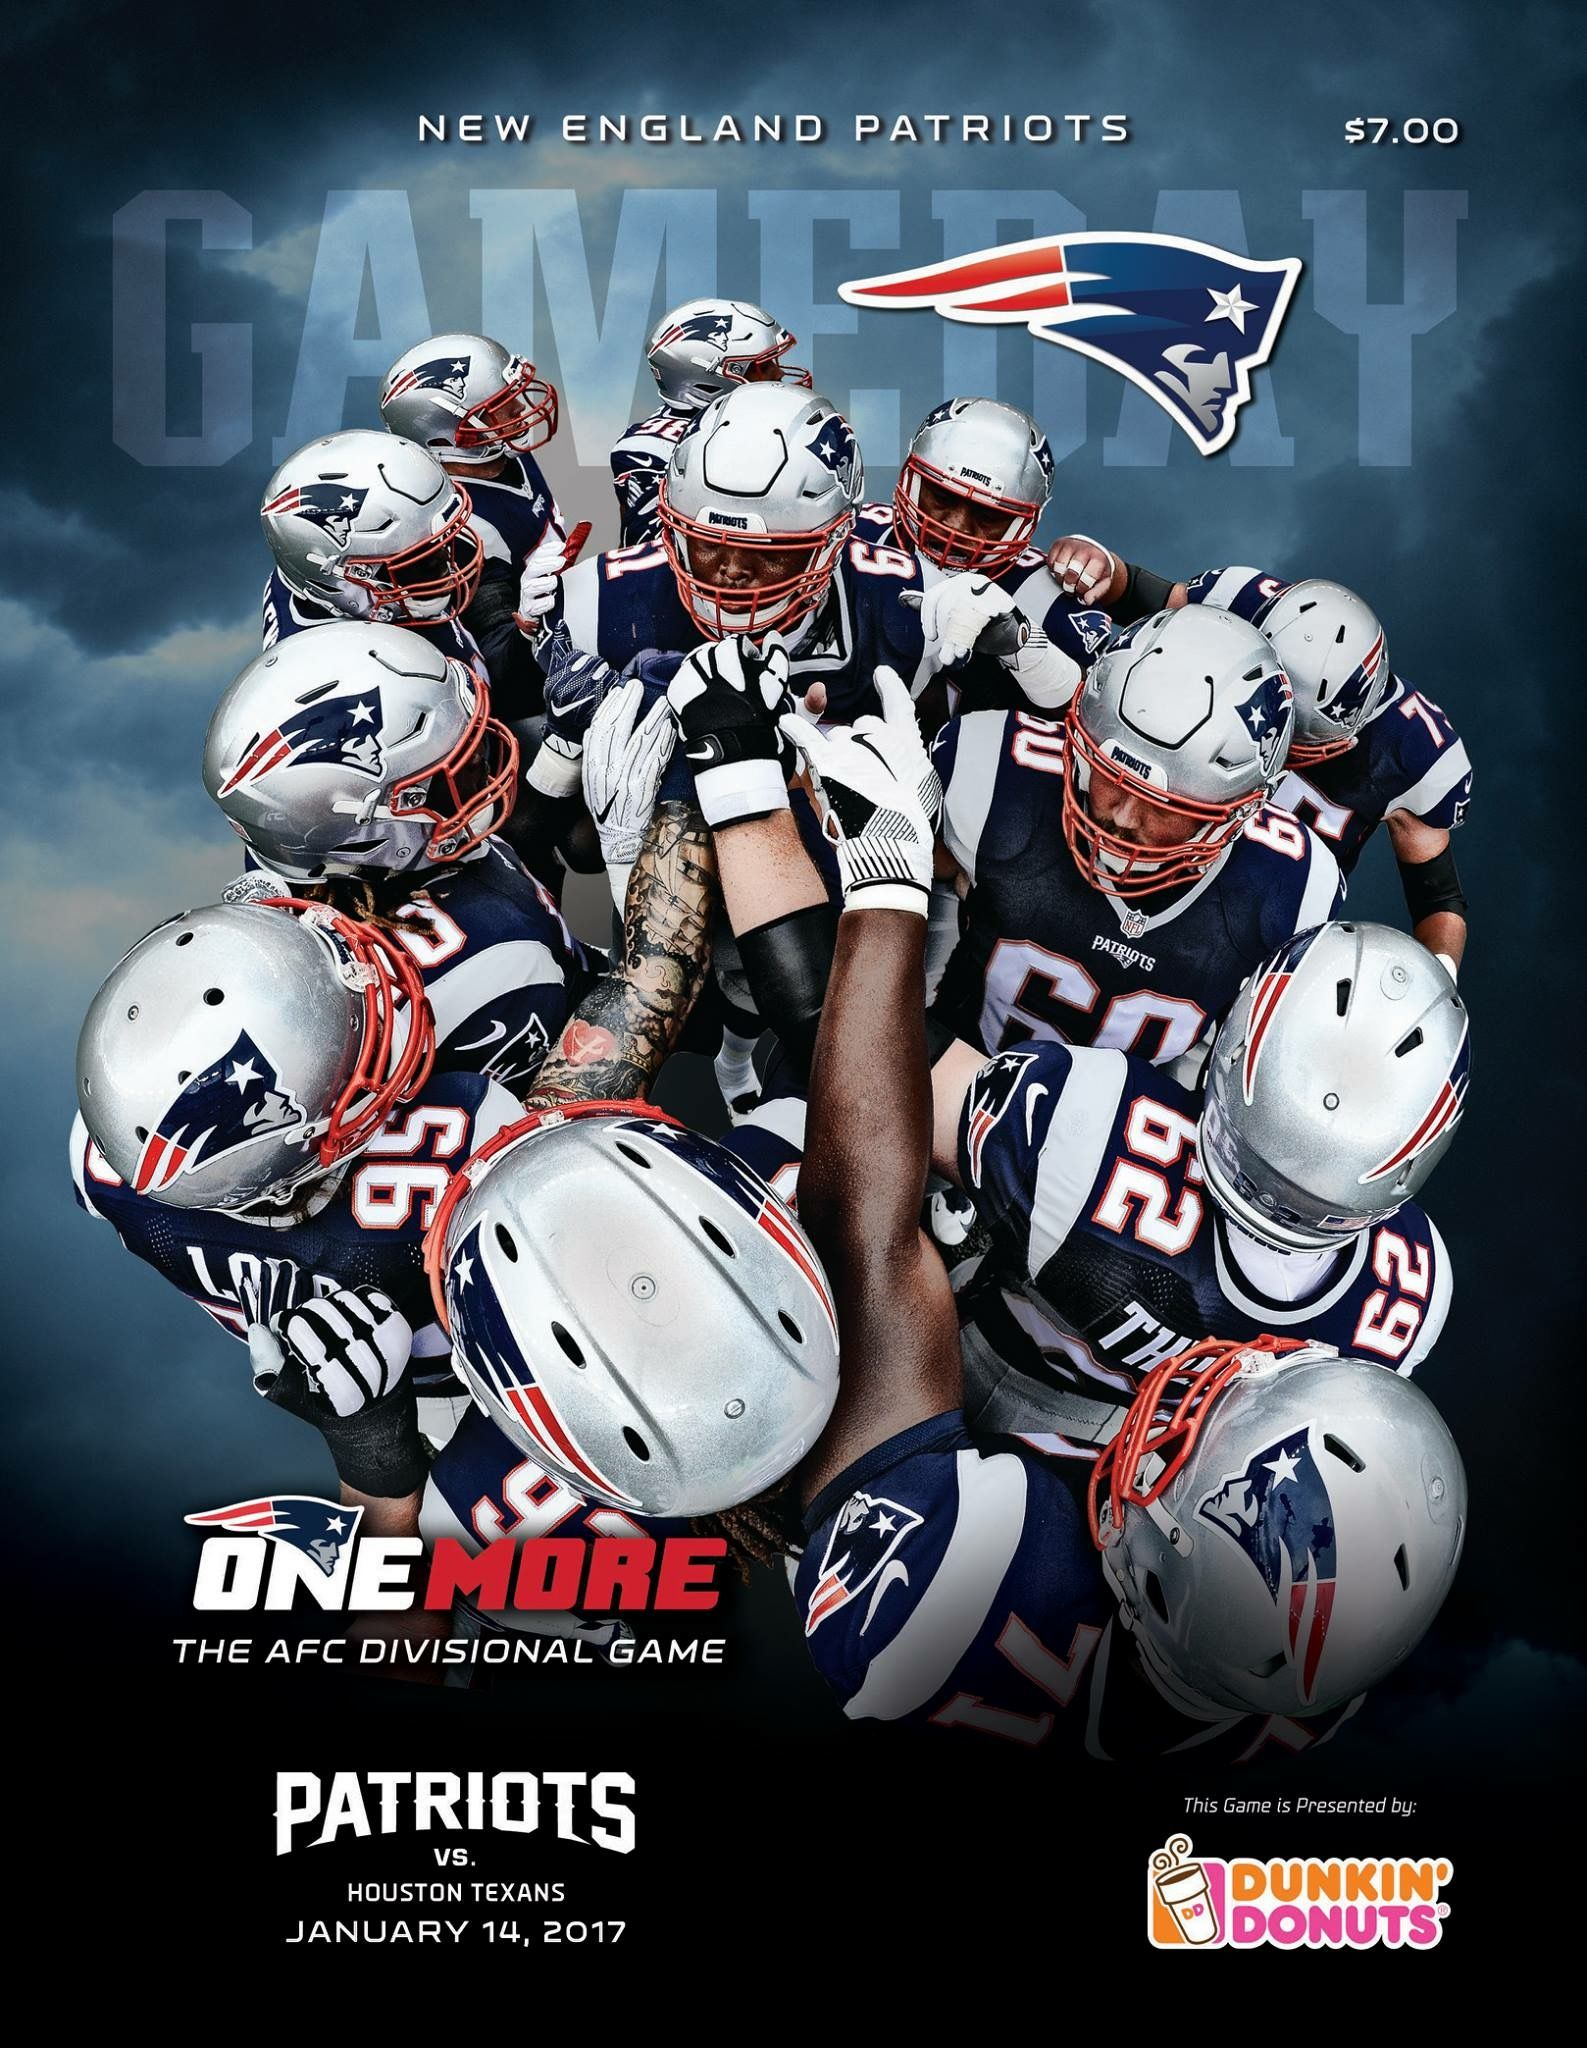 Gameday Program Cover Houvsne Afc Onemore New England Patriots Merchandise New England Patriots Patriots Fans